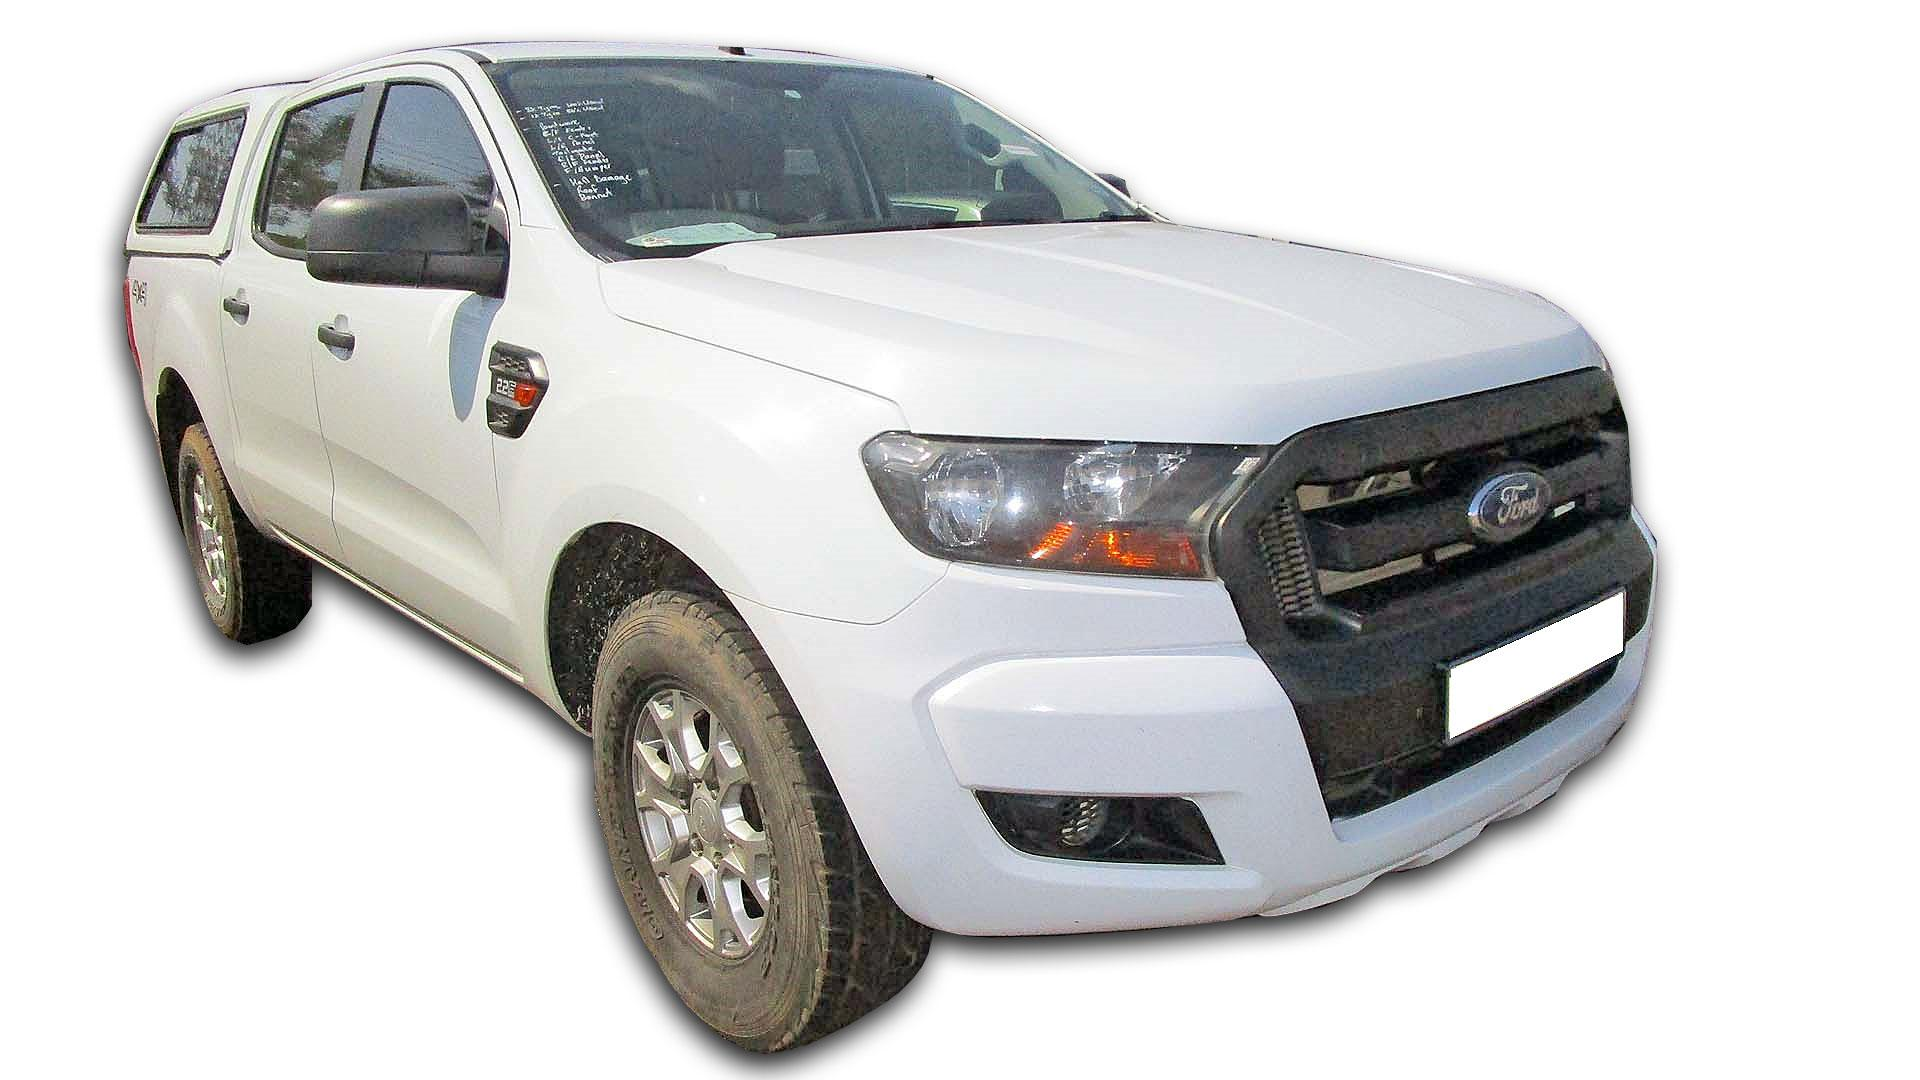 Ford Ranger 2.2 Tdci XL 4X4